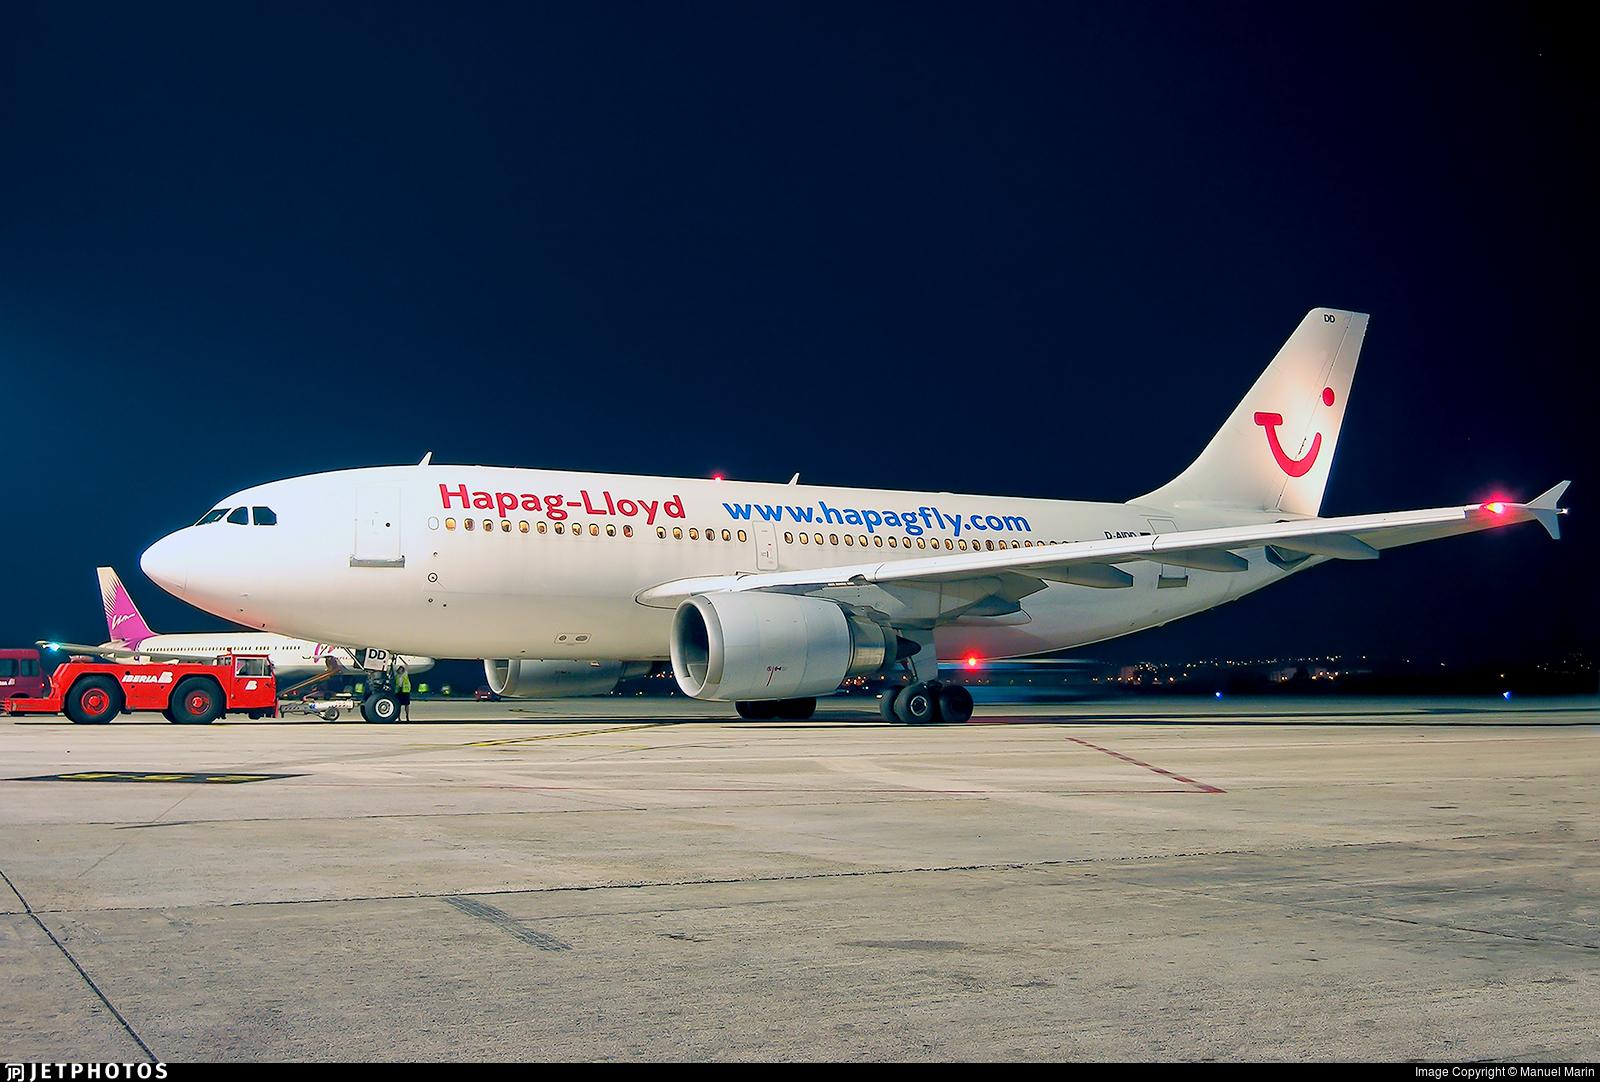 D-AIDD - Airbus A310-304 - Hapag-Lloyd